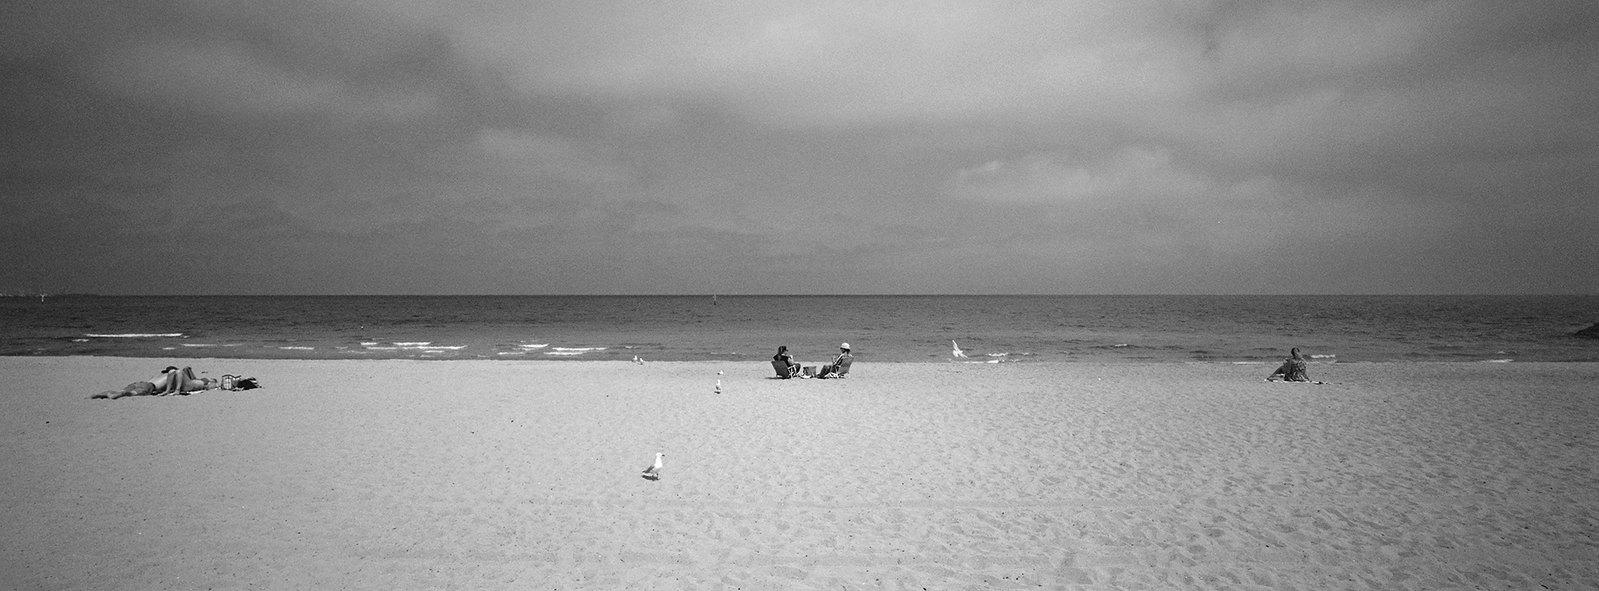 Elwood Beach v